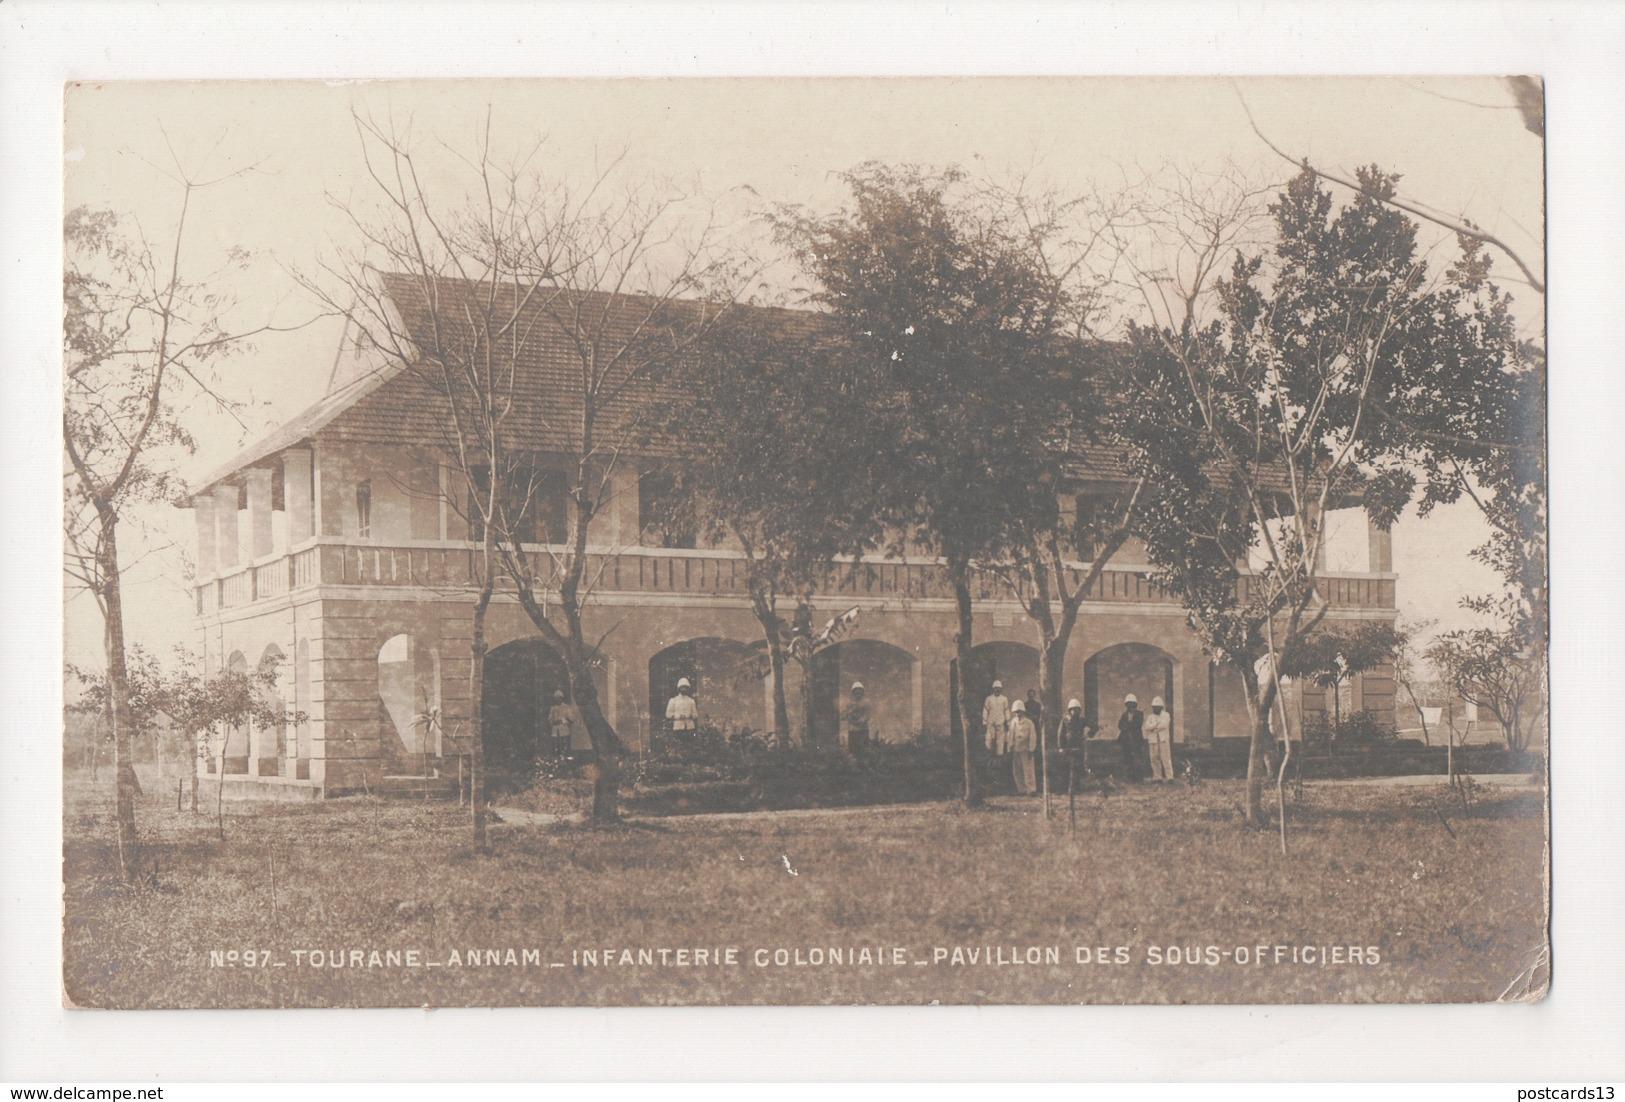 G-896 Annam Vietnam Tourane Infanterie Coloniaie Officers Real Photo Postcard - Postcards